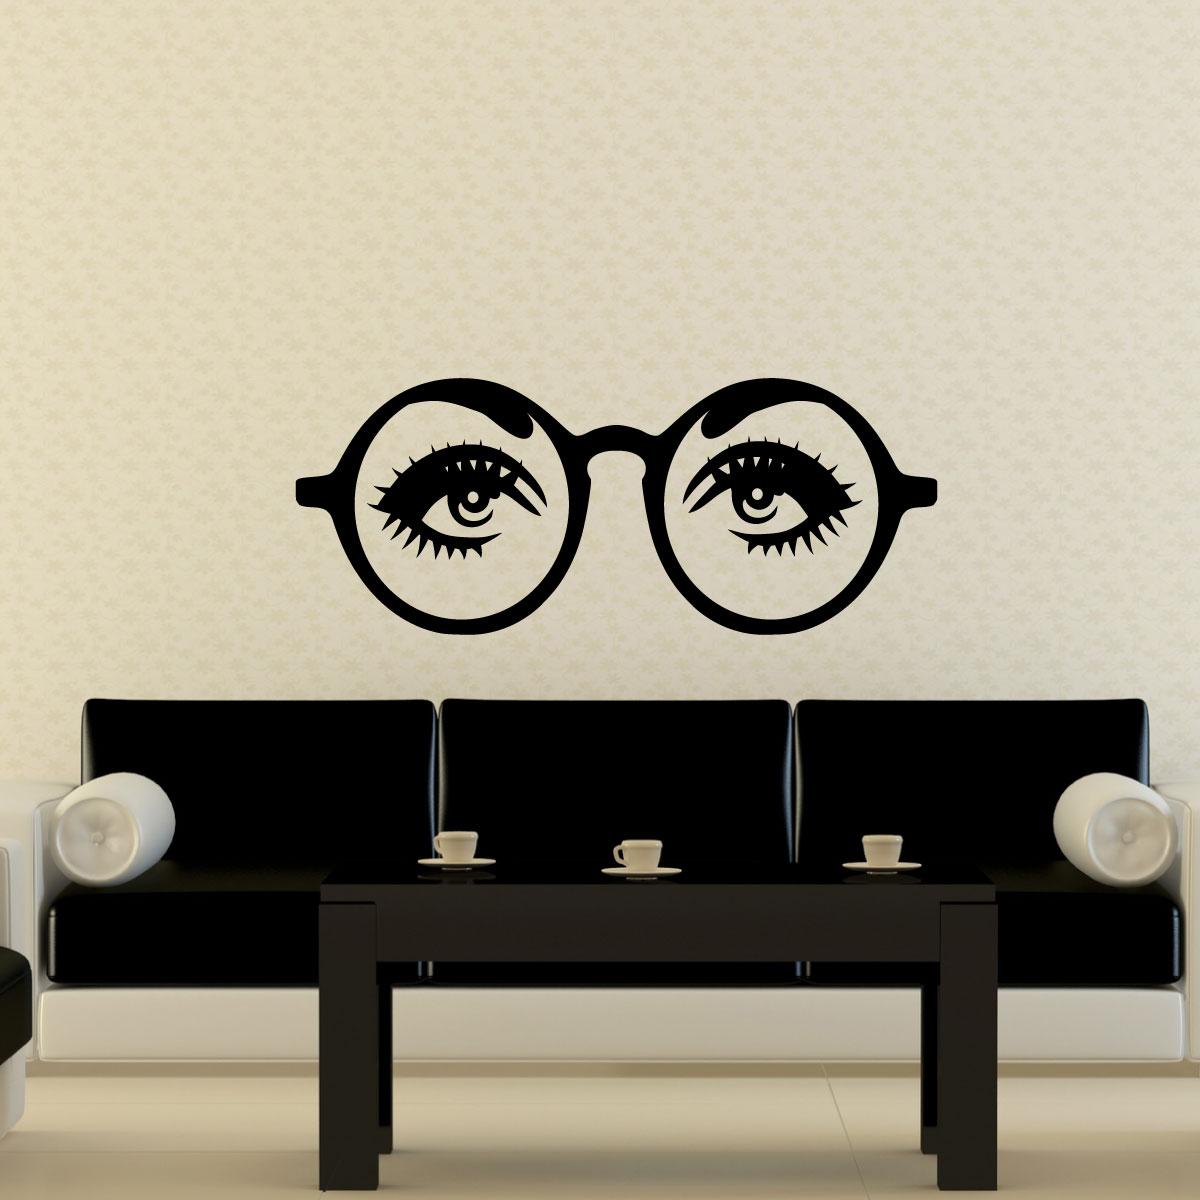 stickers muraux design sticker mural yeux avec des lunettes ambiance. Black Bedroom Furniture Sets. Home Design Ideas